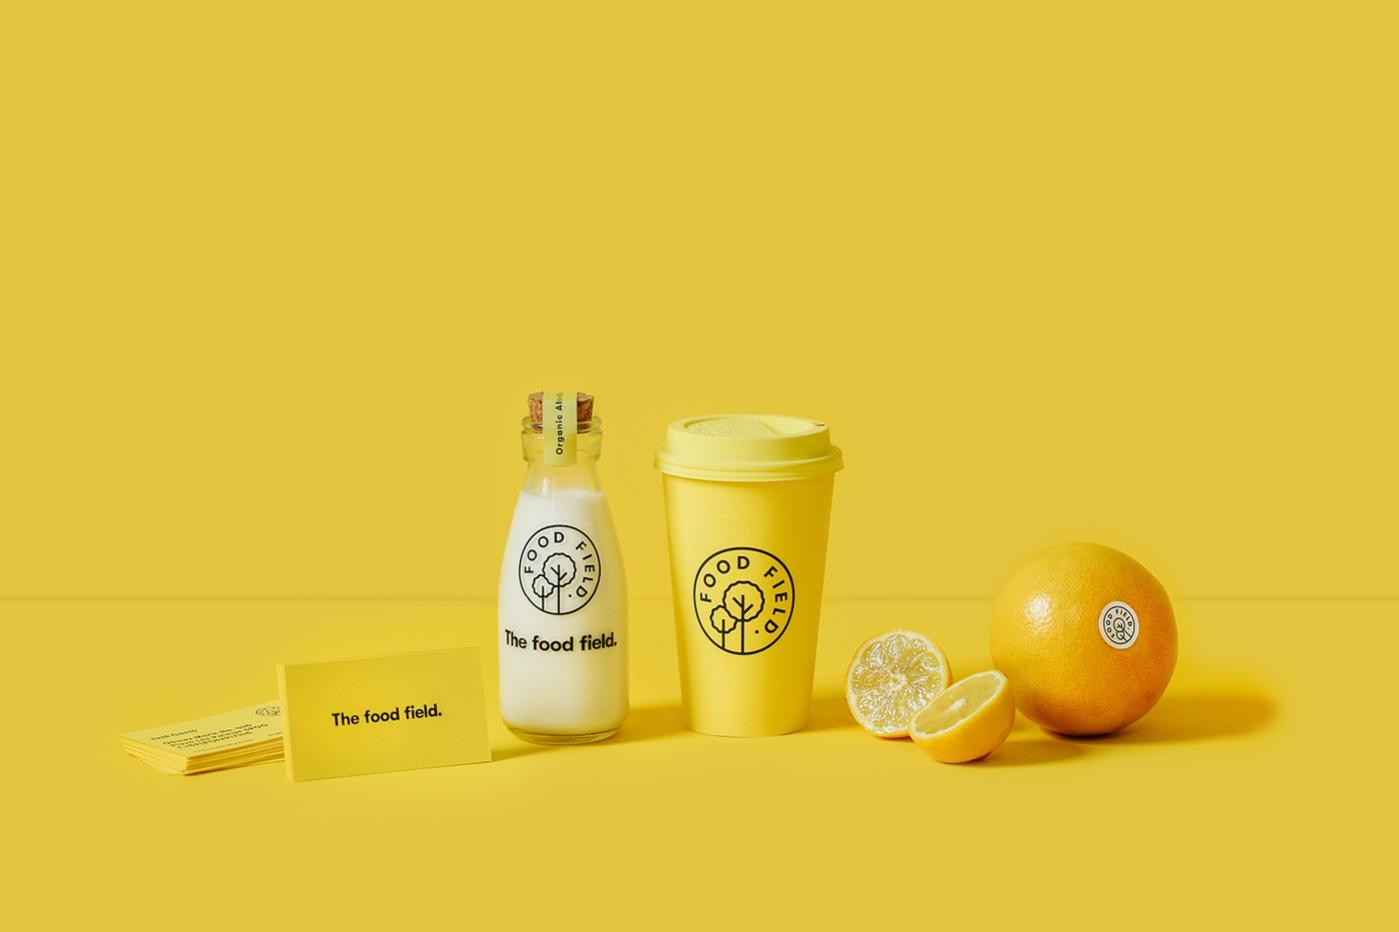 Parametro Food Packaging Design